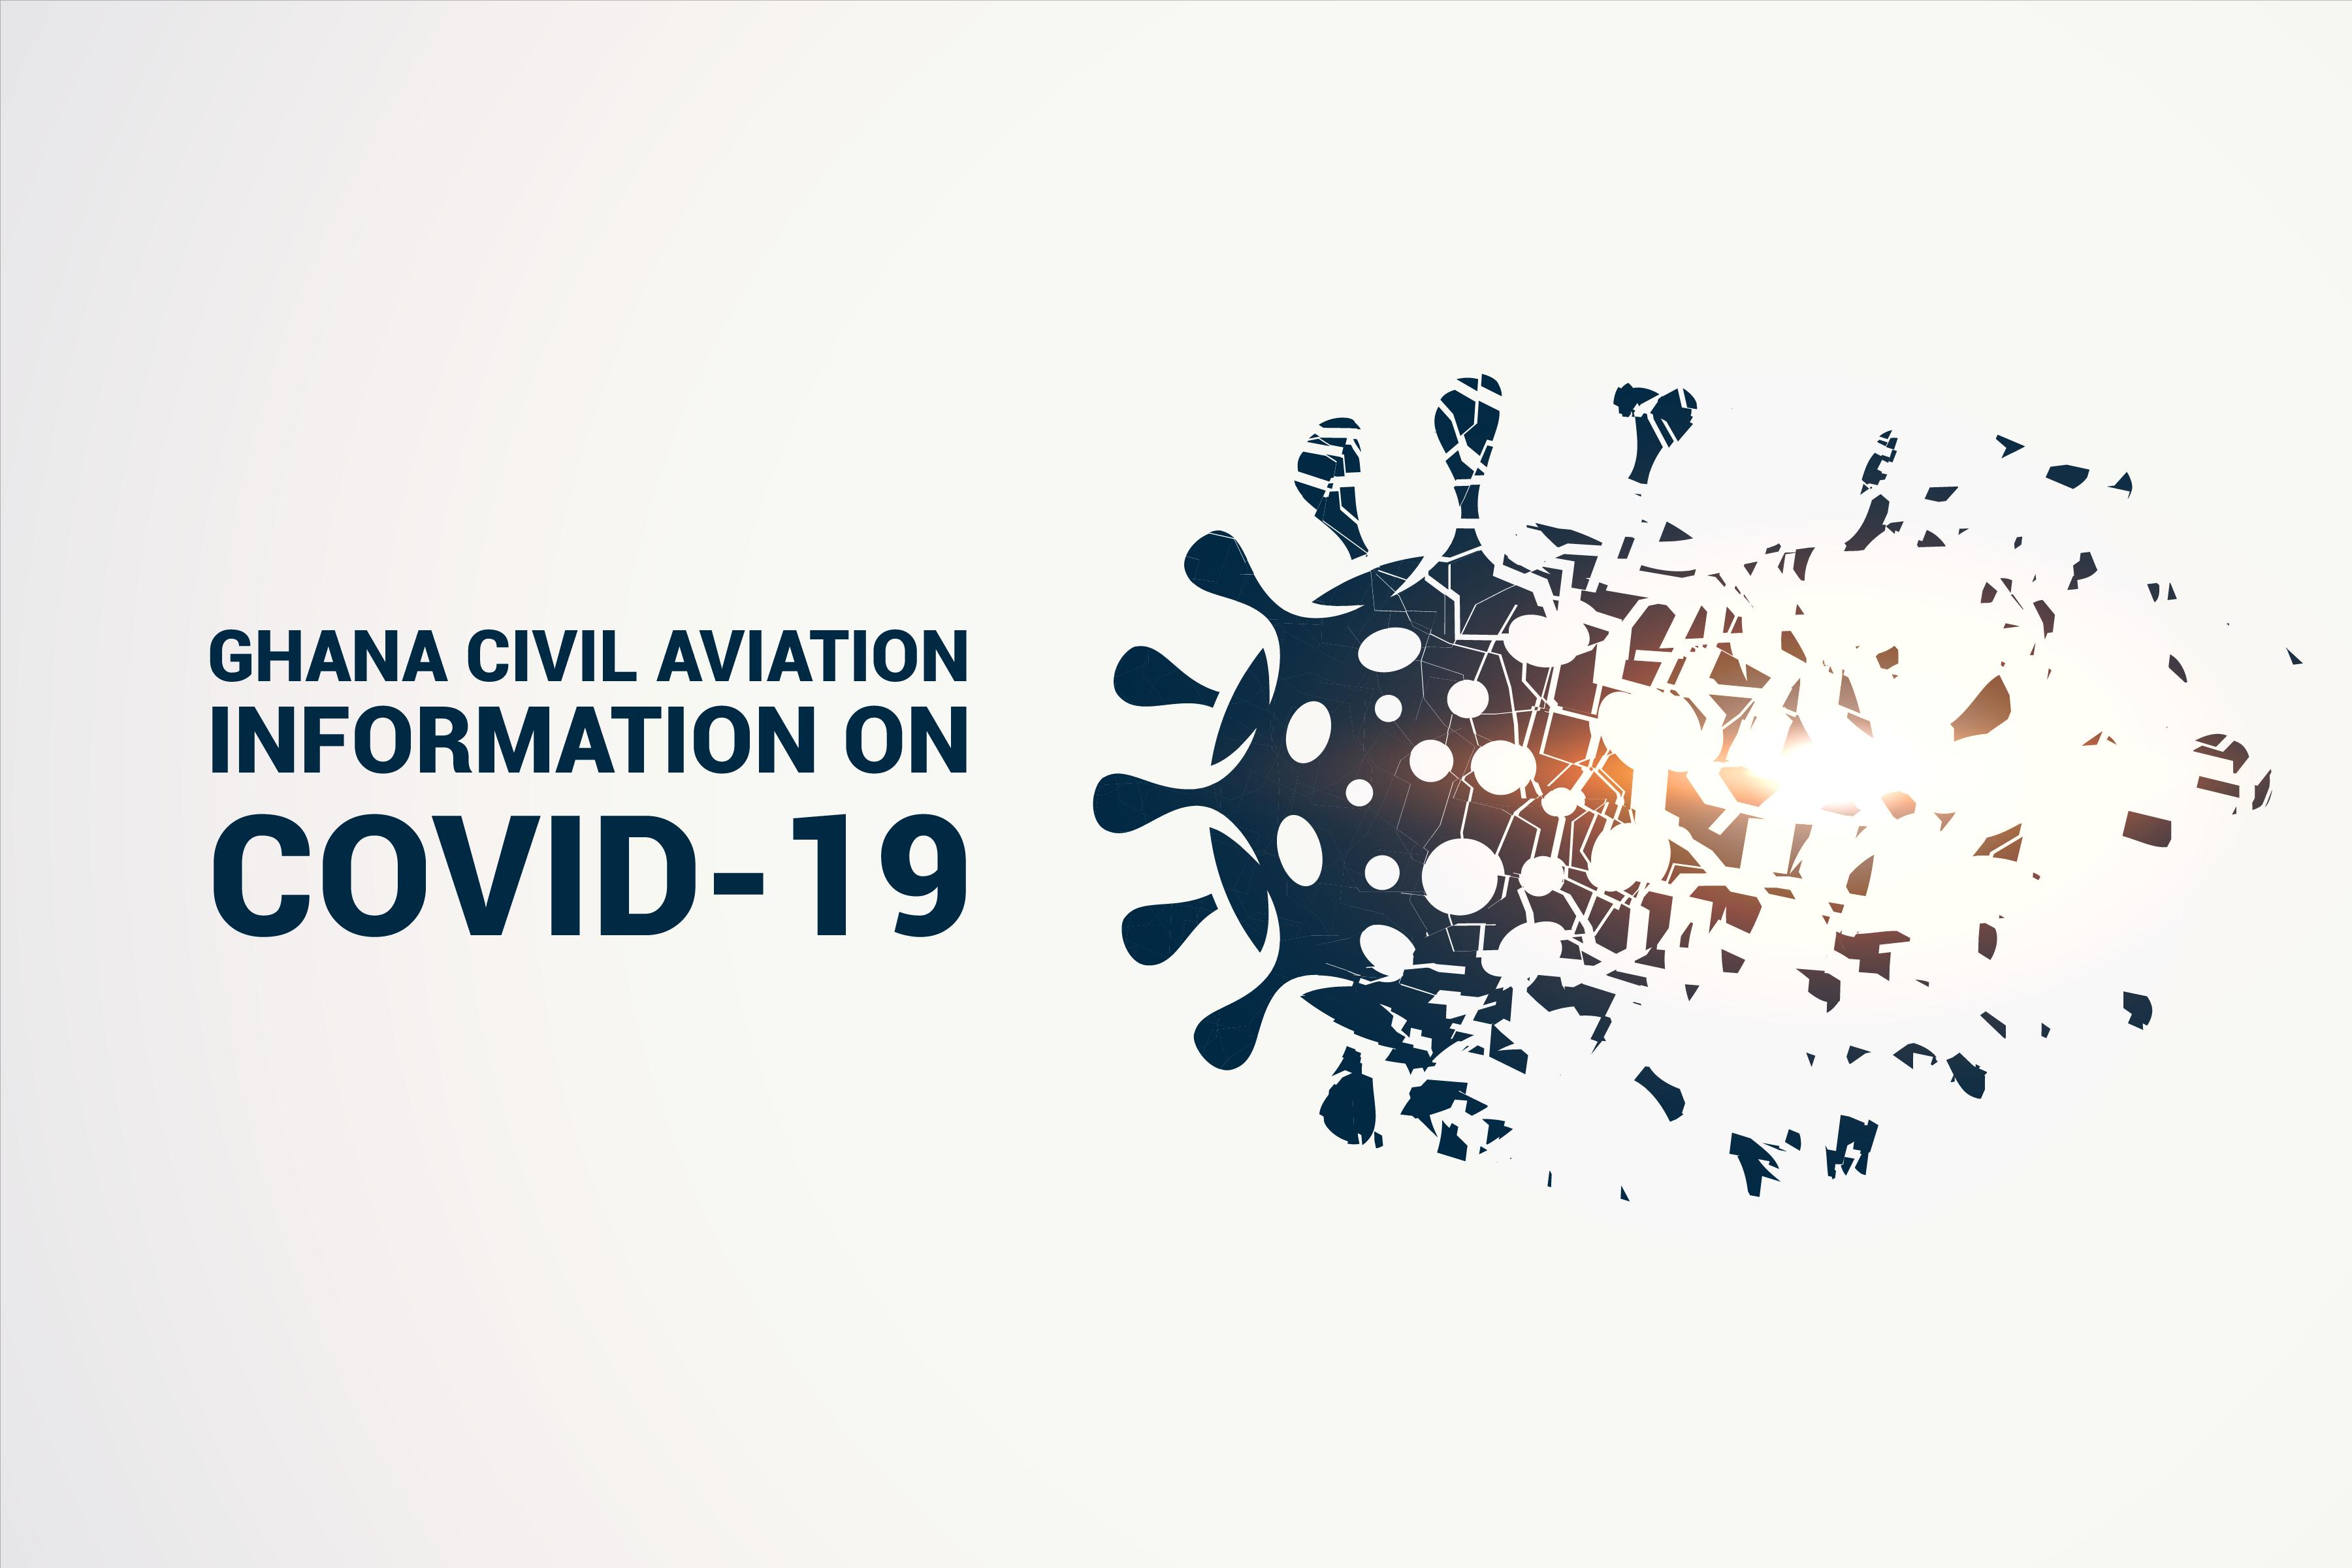 GHANA CIVIL AVIATION INFORMATION ON COVID 19